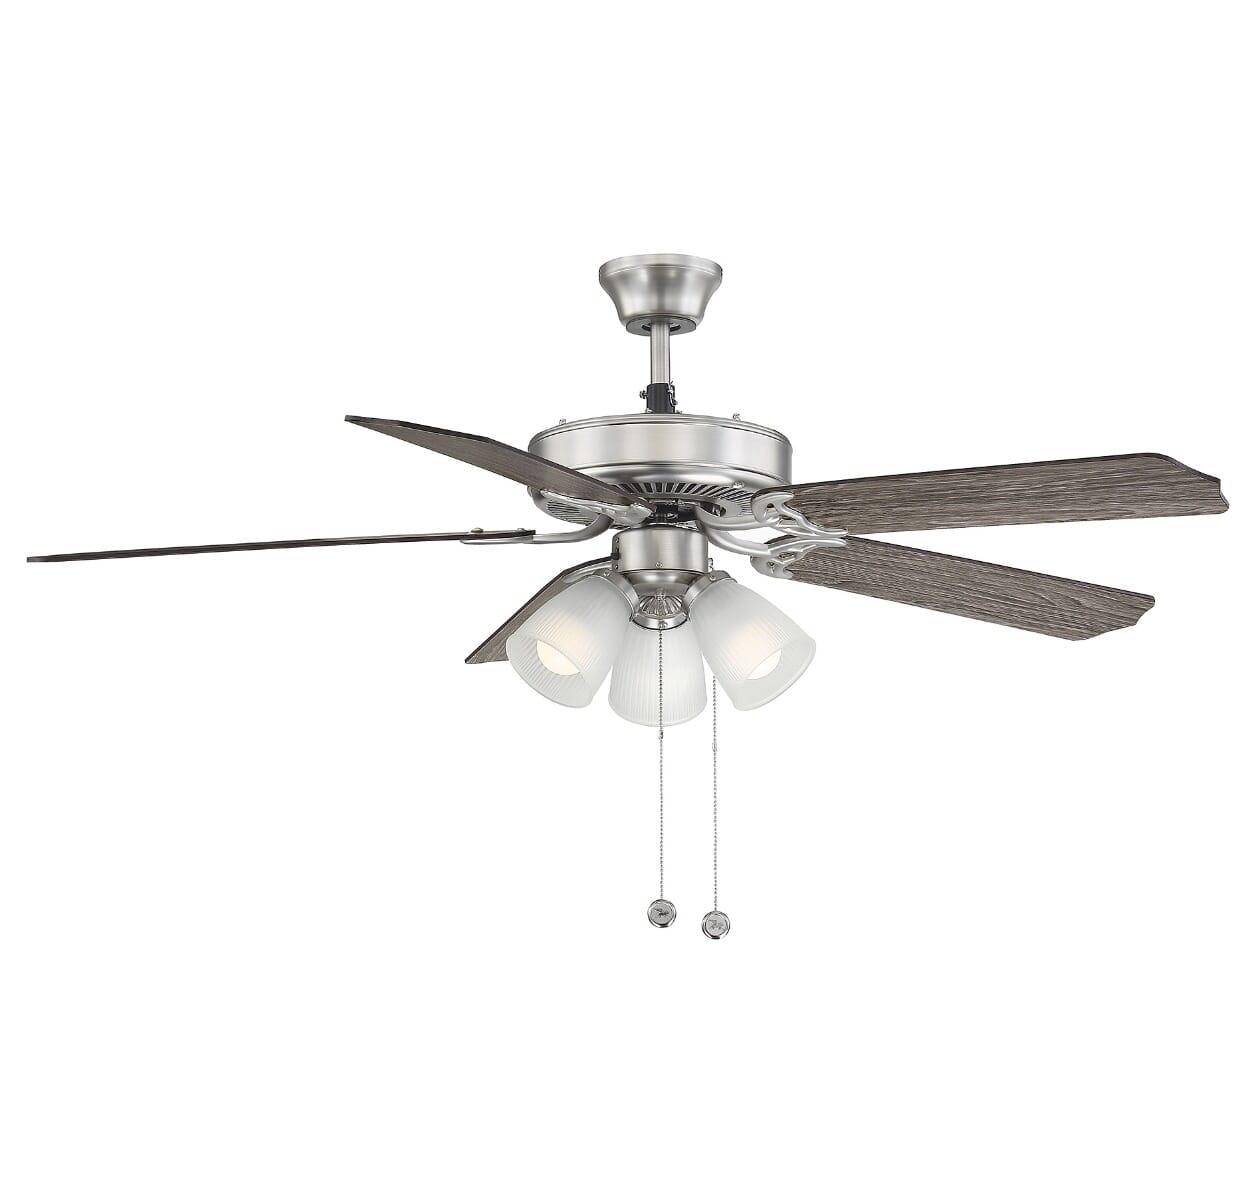 Savoy House First Value 52 3 Light Ceiling Fan In Satin Nickel Lightsonline Com